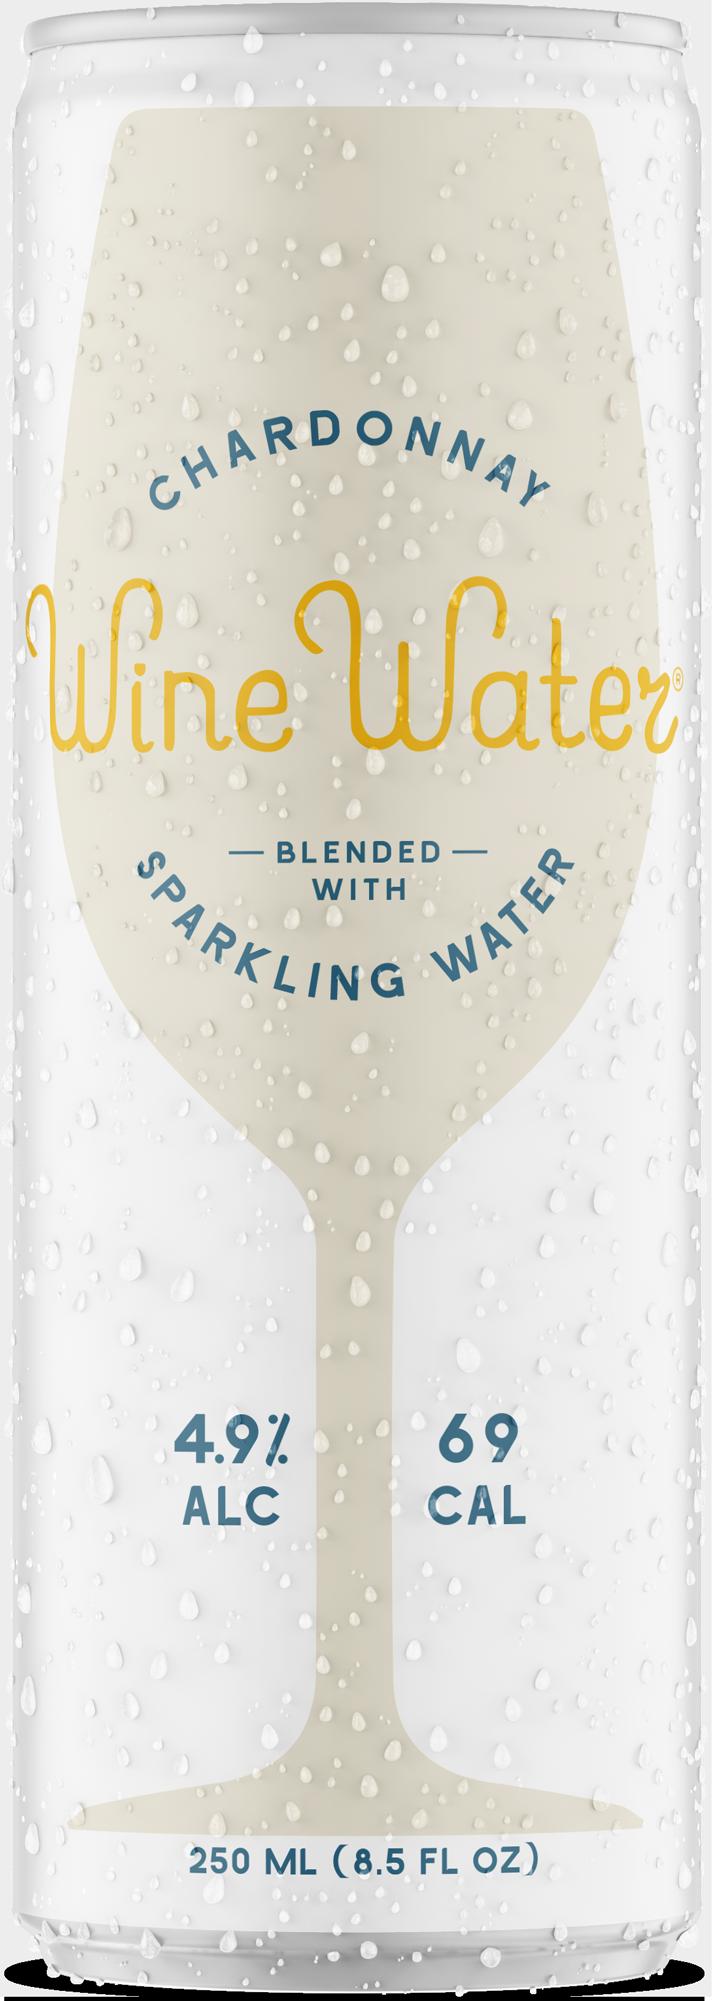 Wine-Water-Chardonnay-Can-Mockup-v2